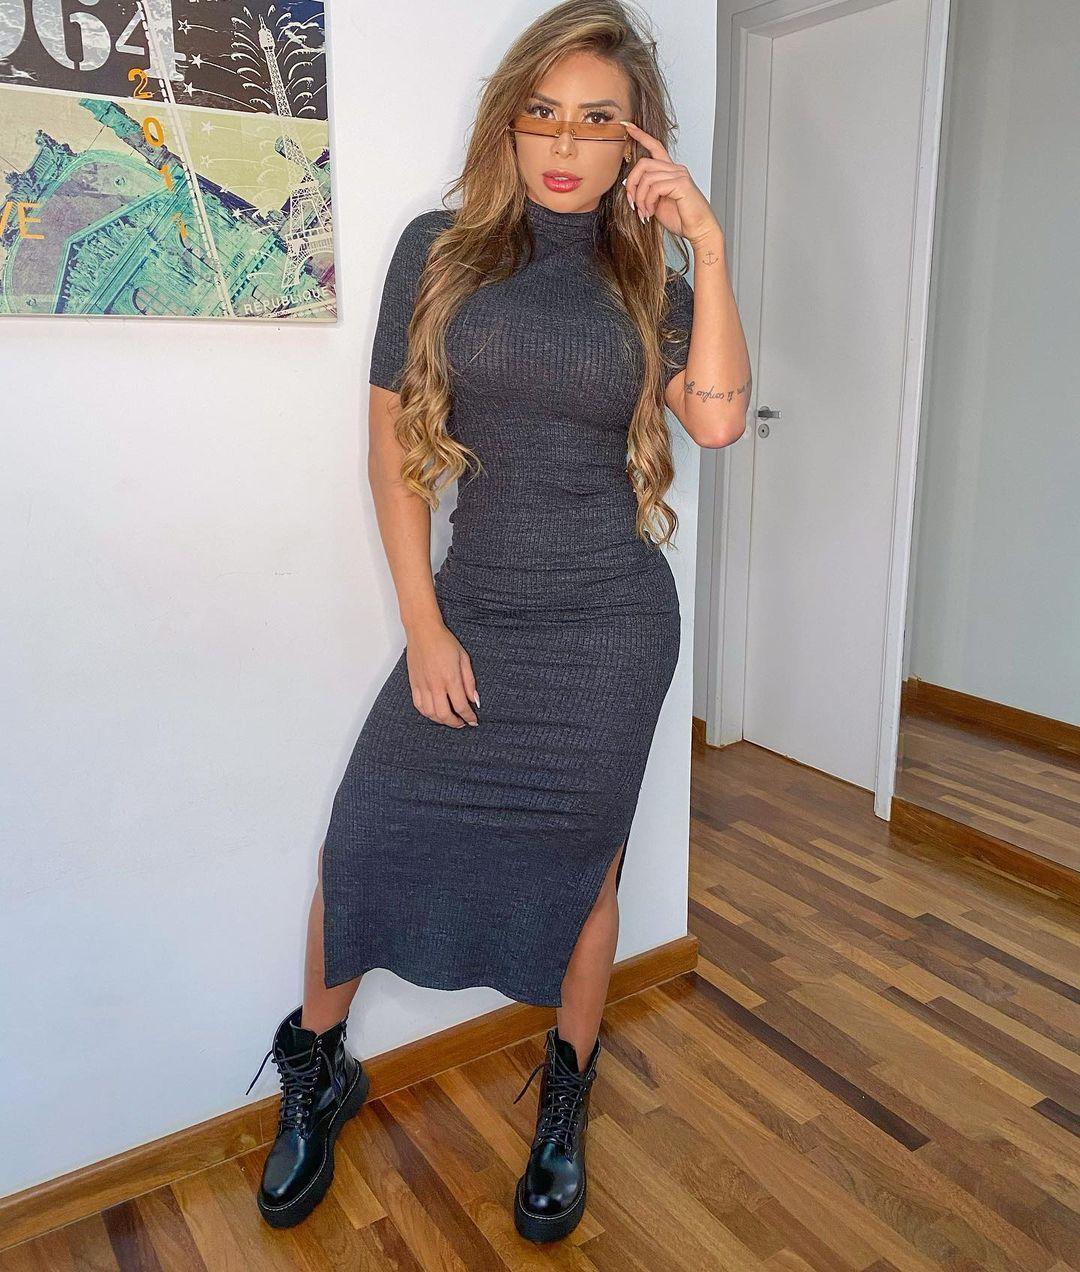 Alessandra-Batista-Wallpapers-Insta-FIt-Bio-2